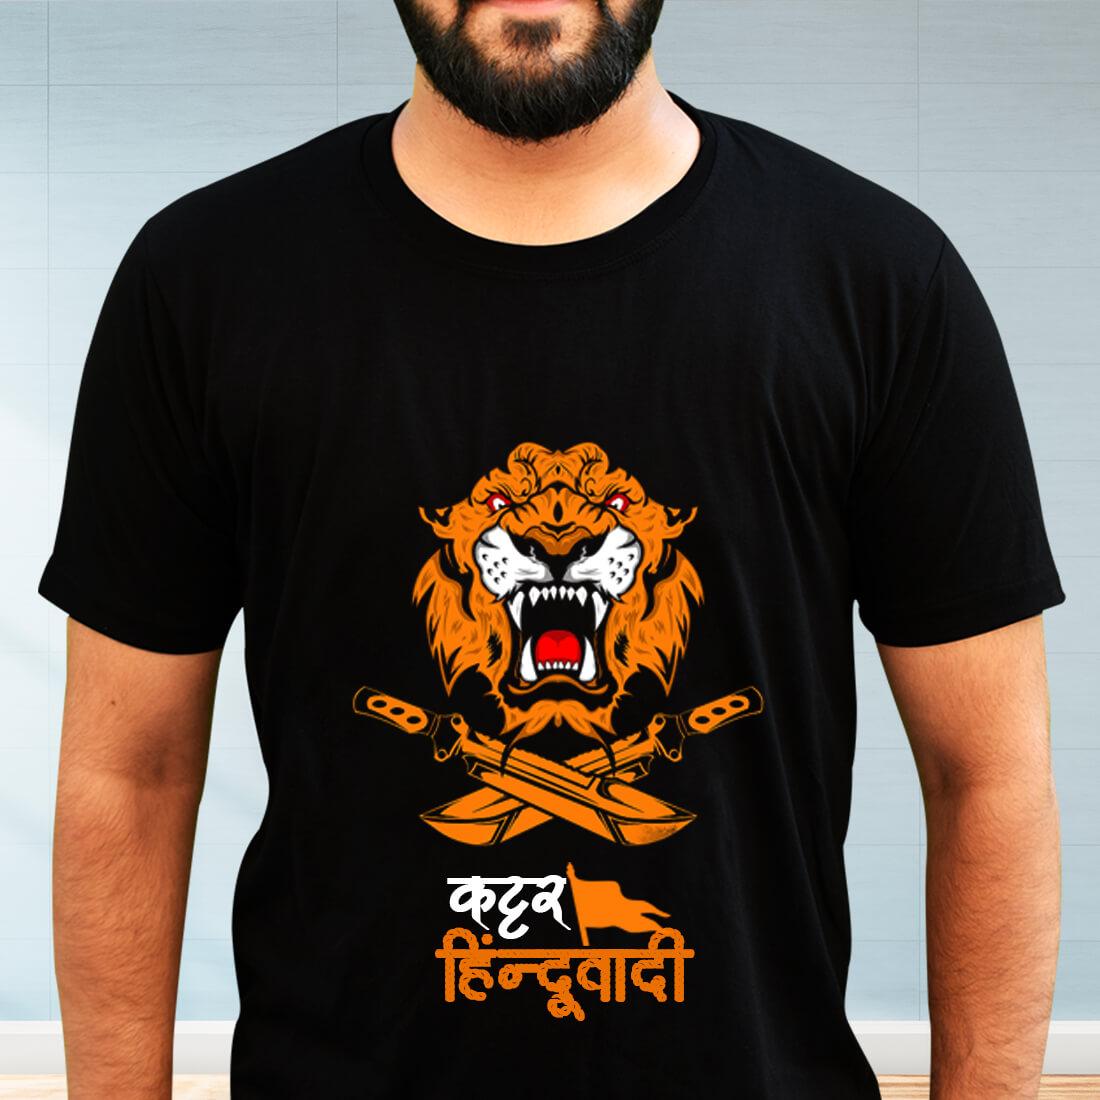 Kattar Hinduvadi Quotes Printed Black T Shirt For Men